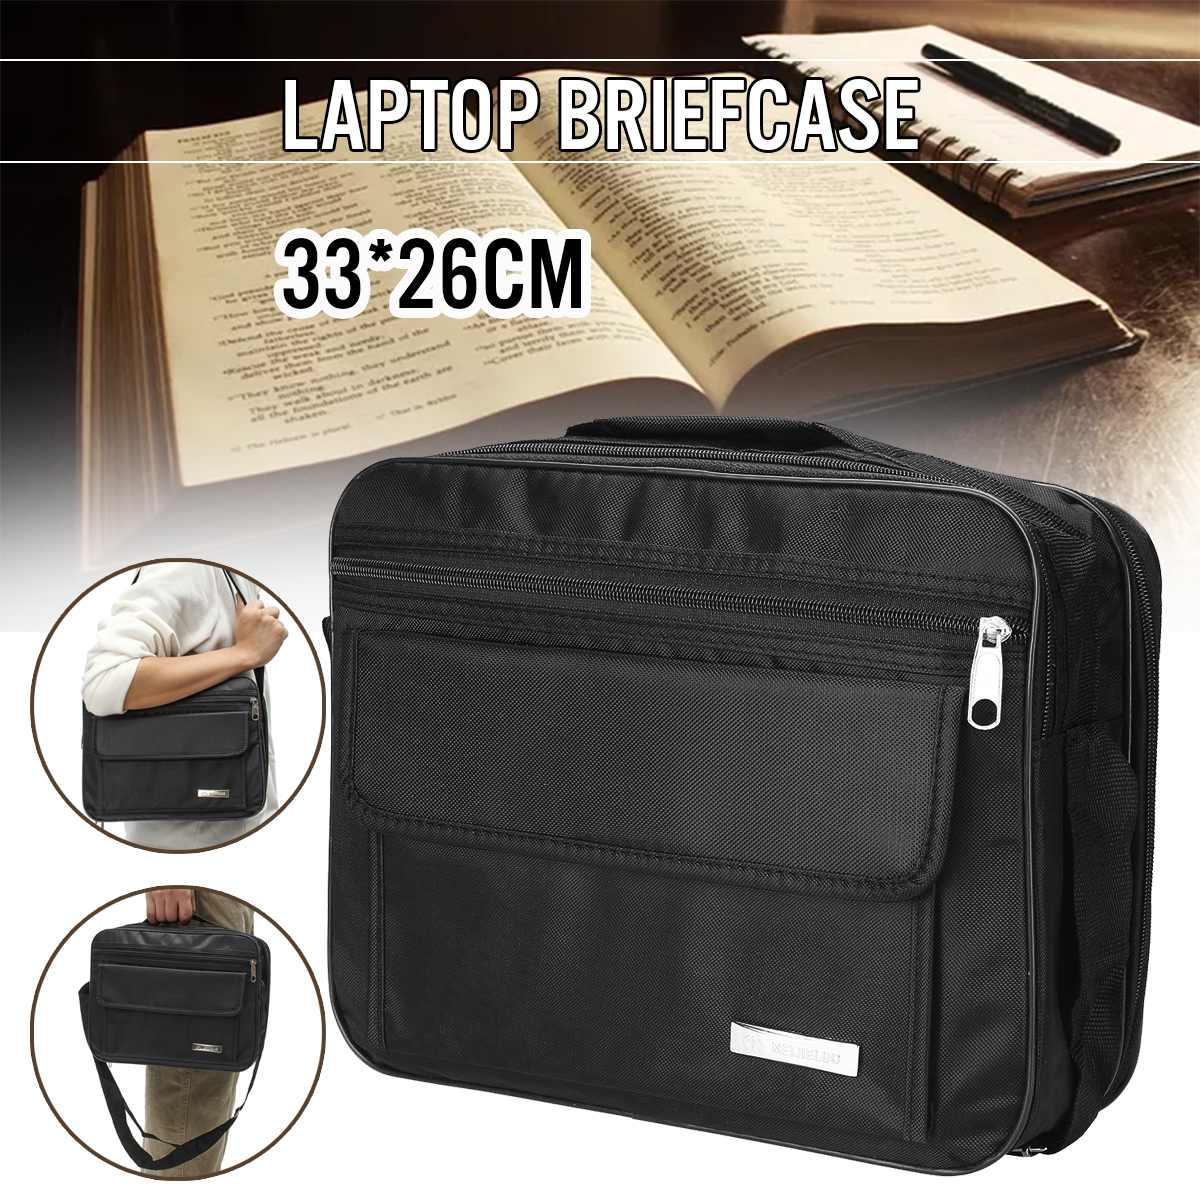 Computer Laptop Bags Business Portable Nylon Computer Handbags Zipper Shoulder Simple Waterproof Laptop Shoulder Handbags Cases